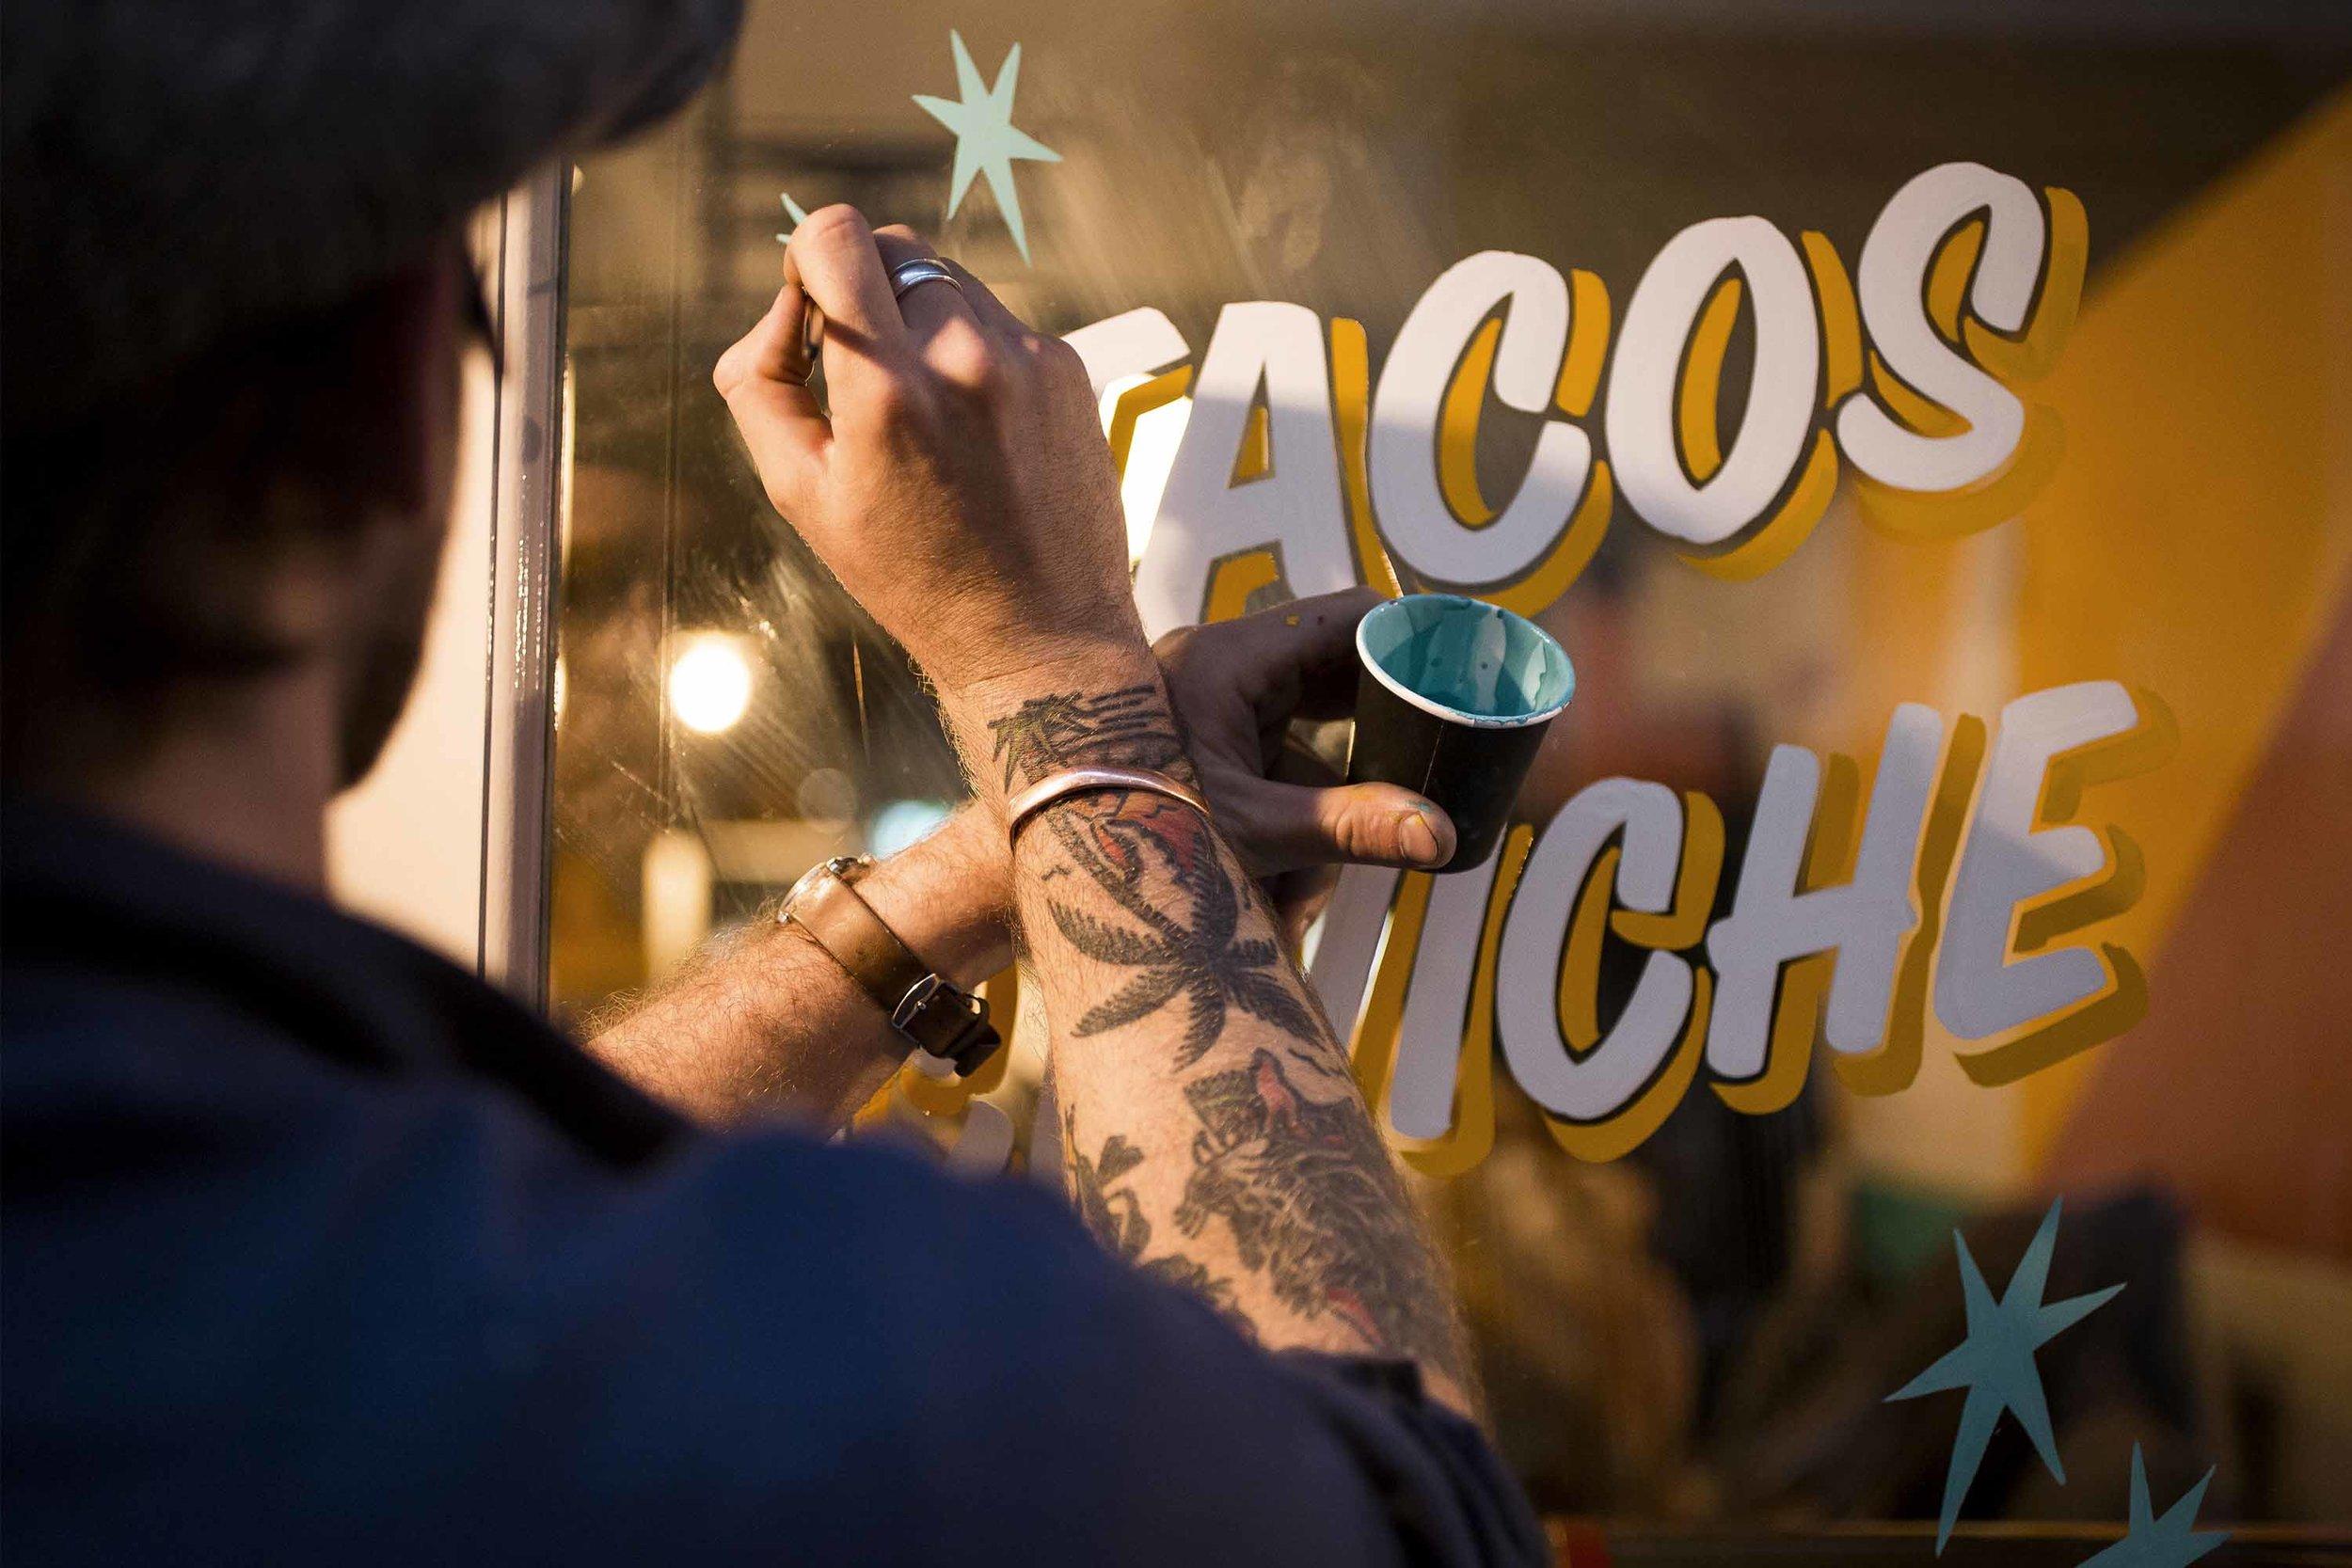 ged palmer sign painting casual breddos tacos